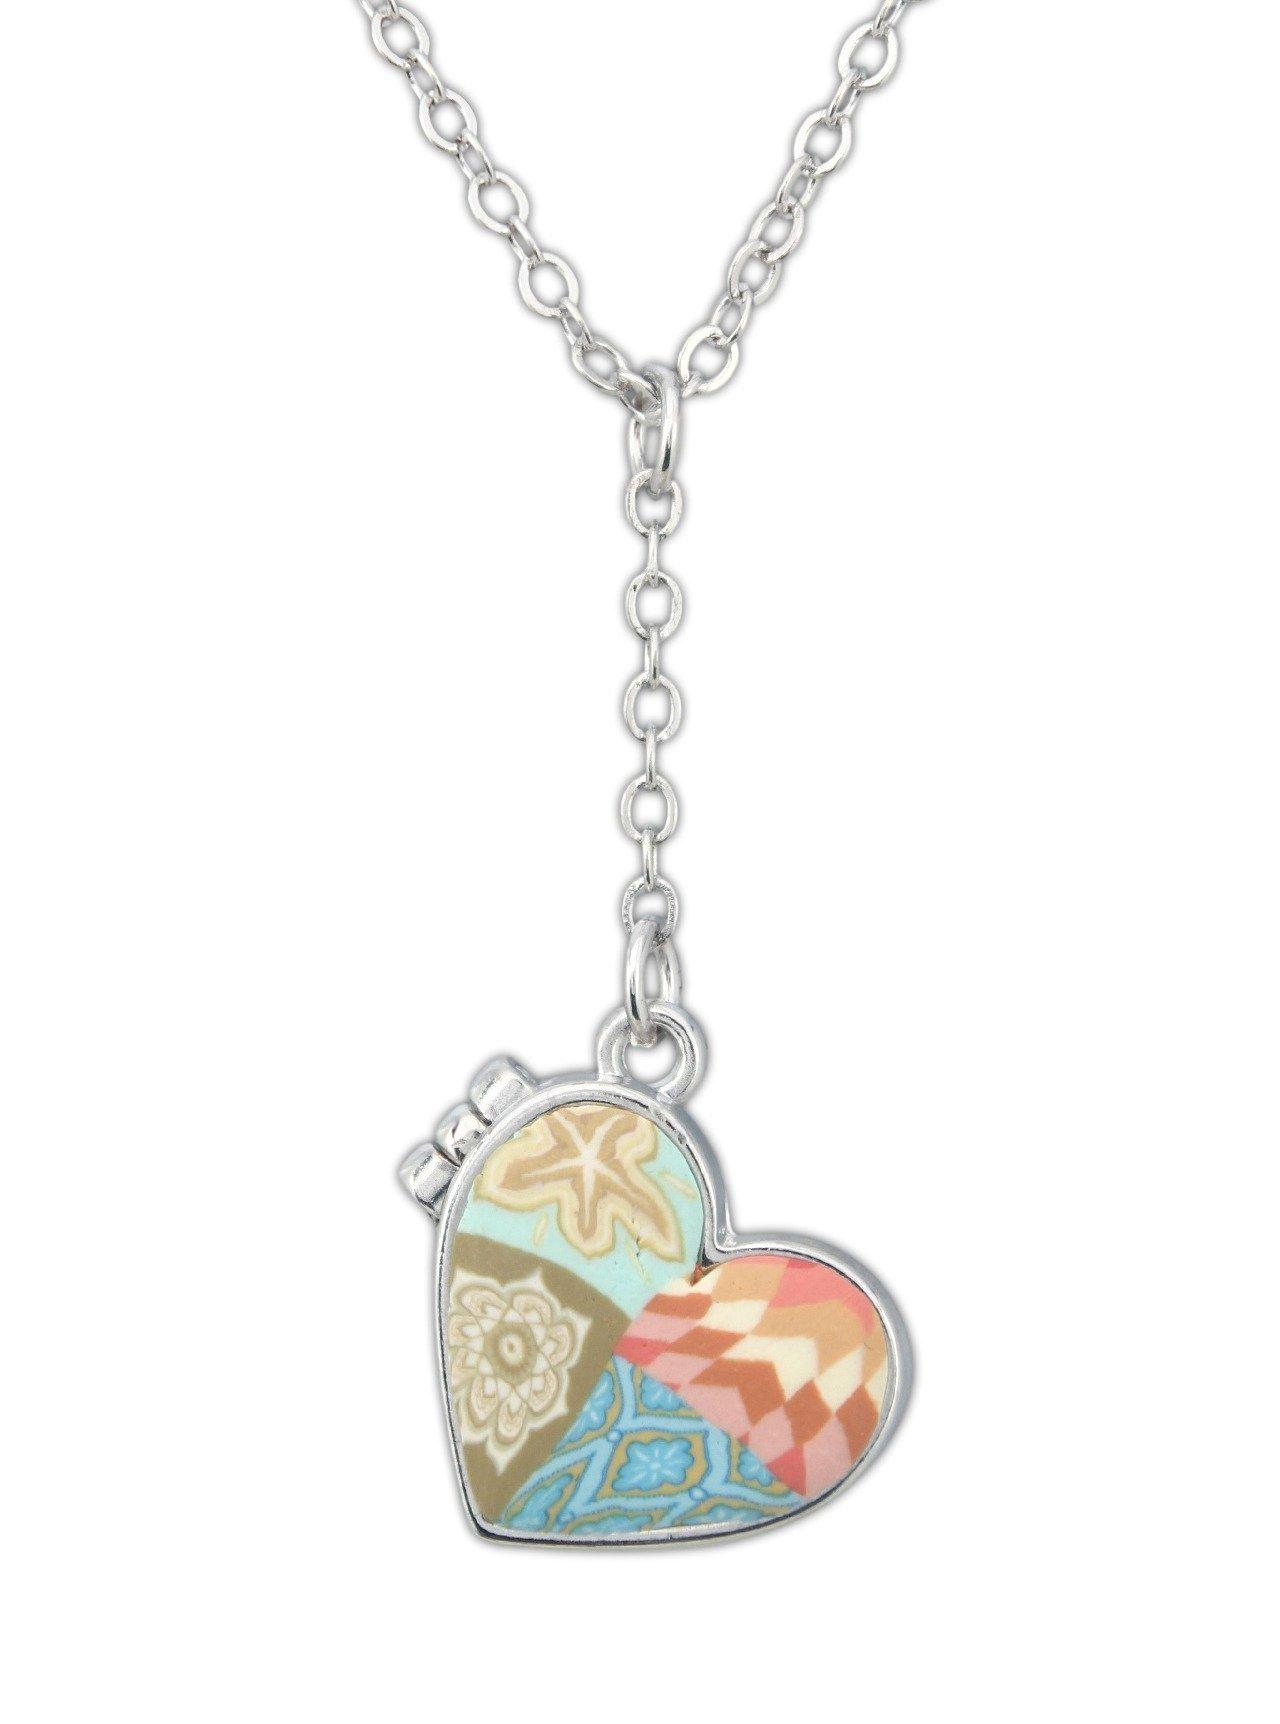 Jilzarah 16'' Heart Shaped Polymer Clay Locket Necklace with 4'' Extender (Parakeet) by JILZARAH